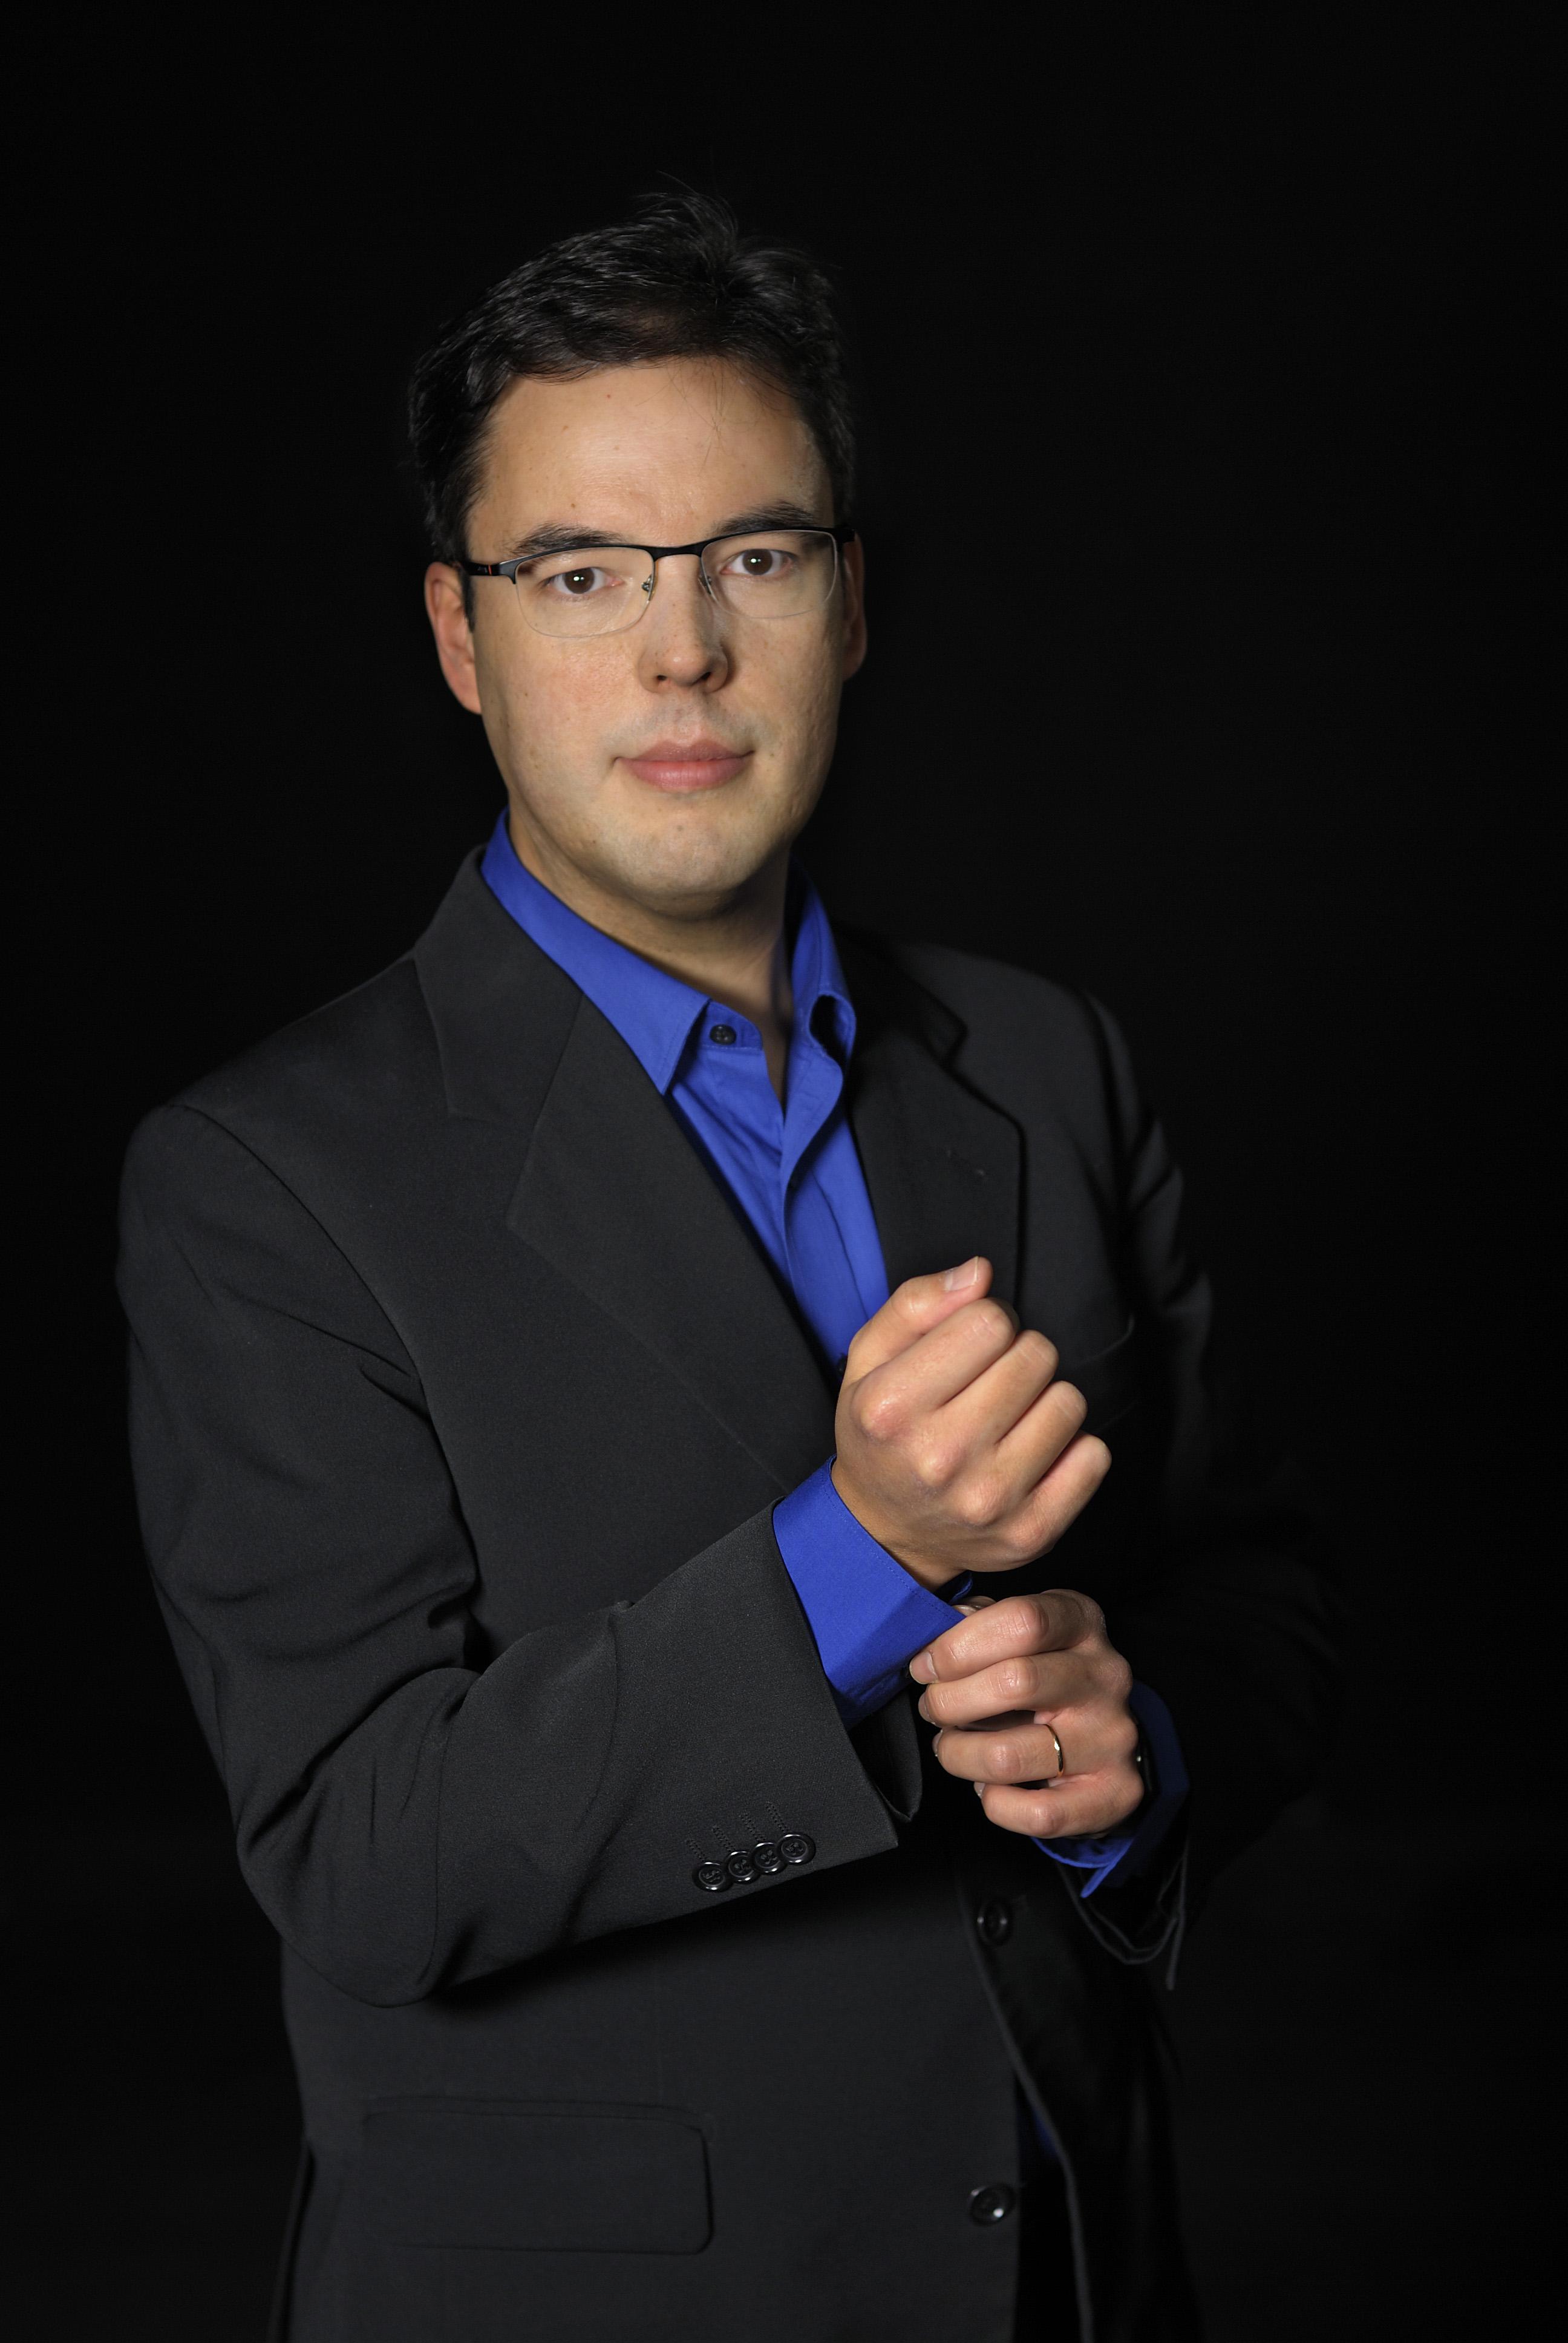 Claudio Ribeiro, harpsichord